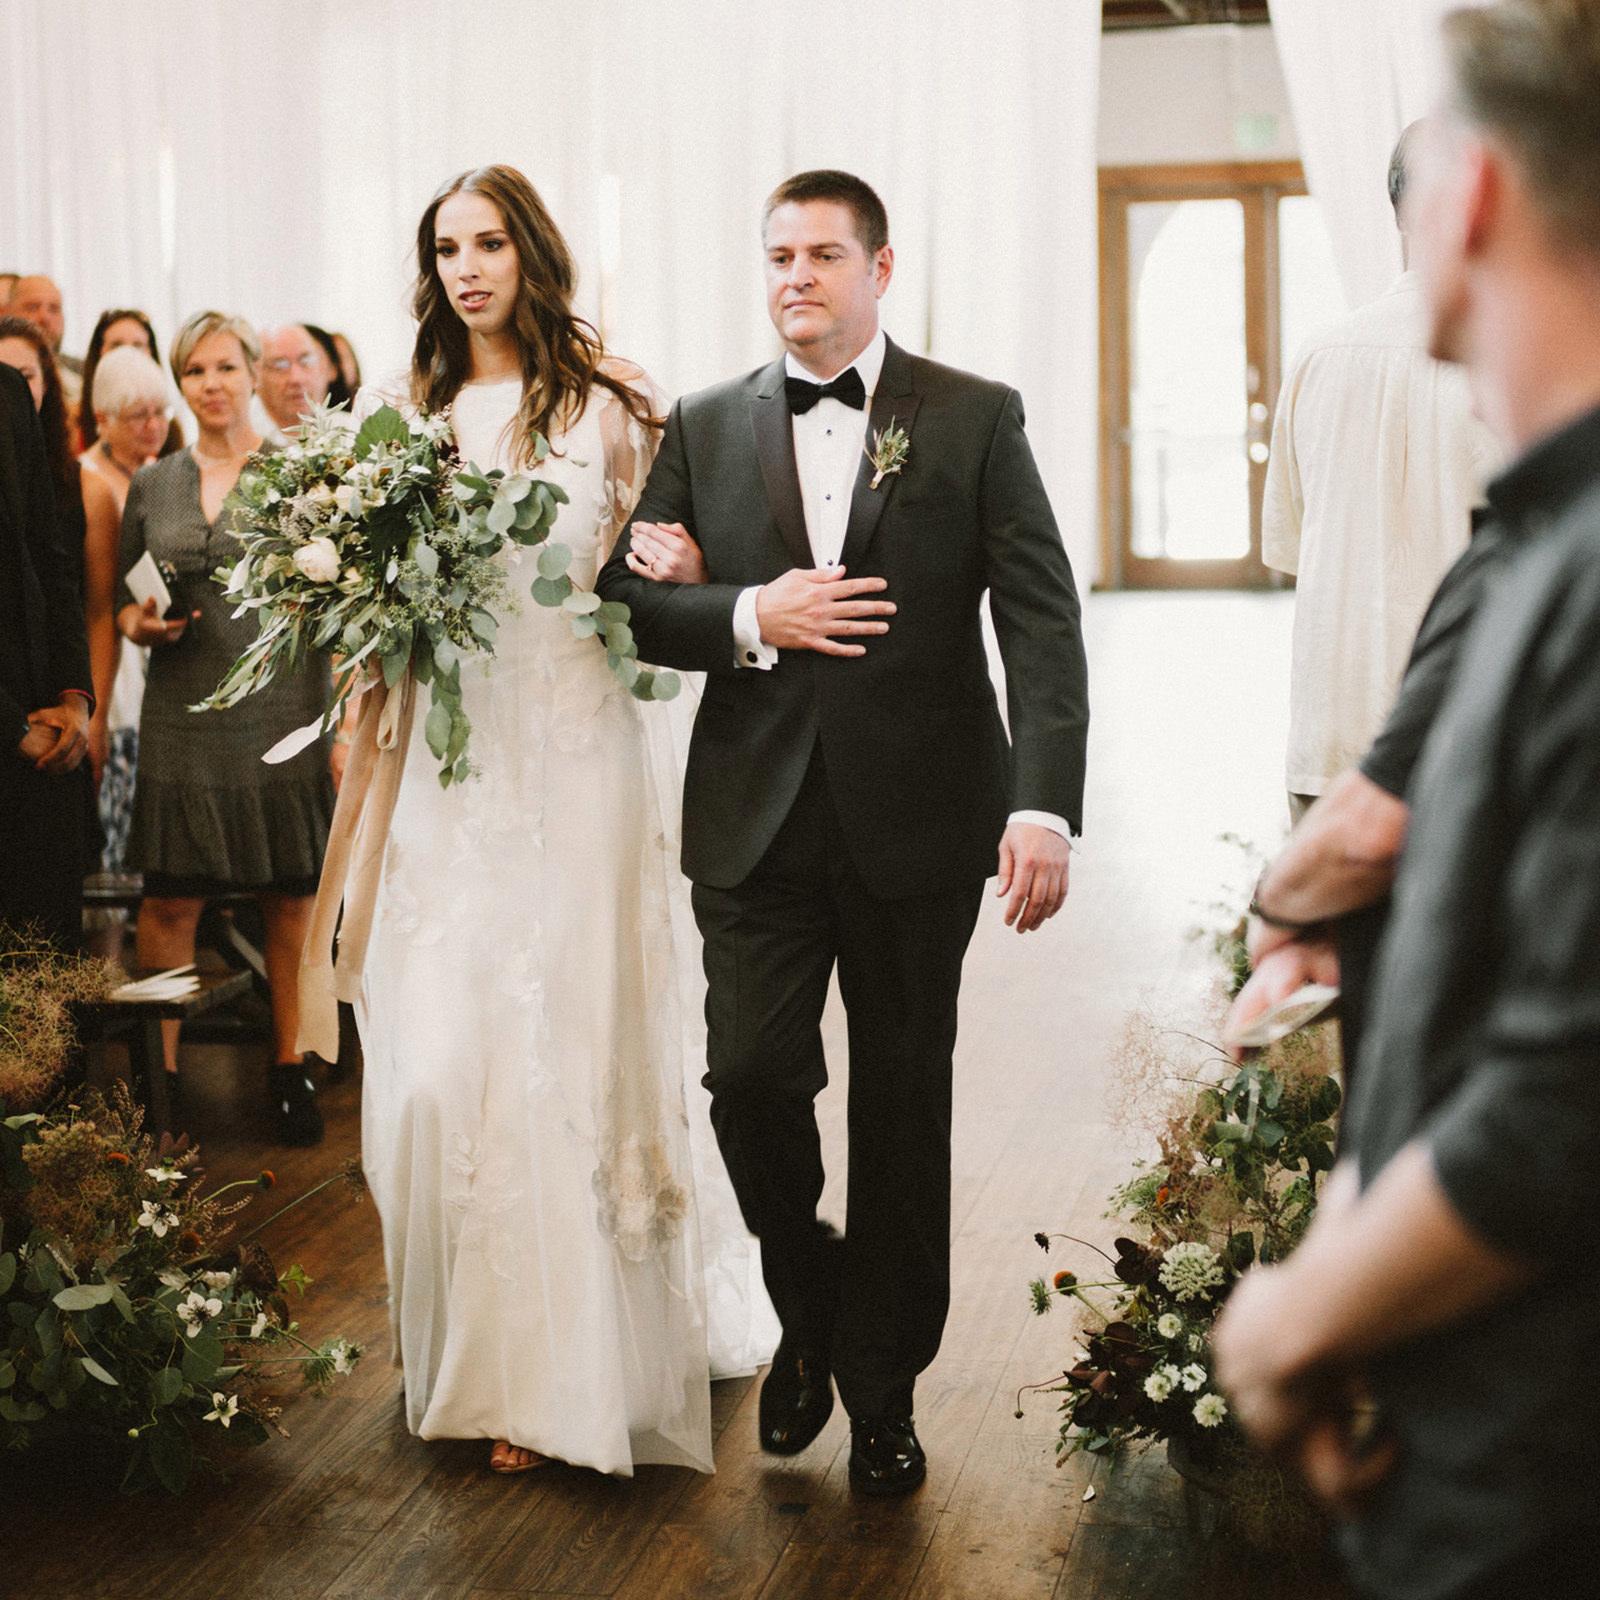 sodo-park-wedding-036 SODO PARK WEDDING